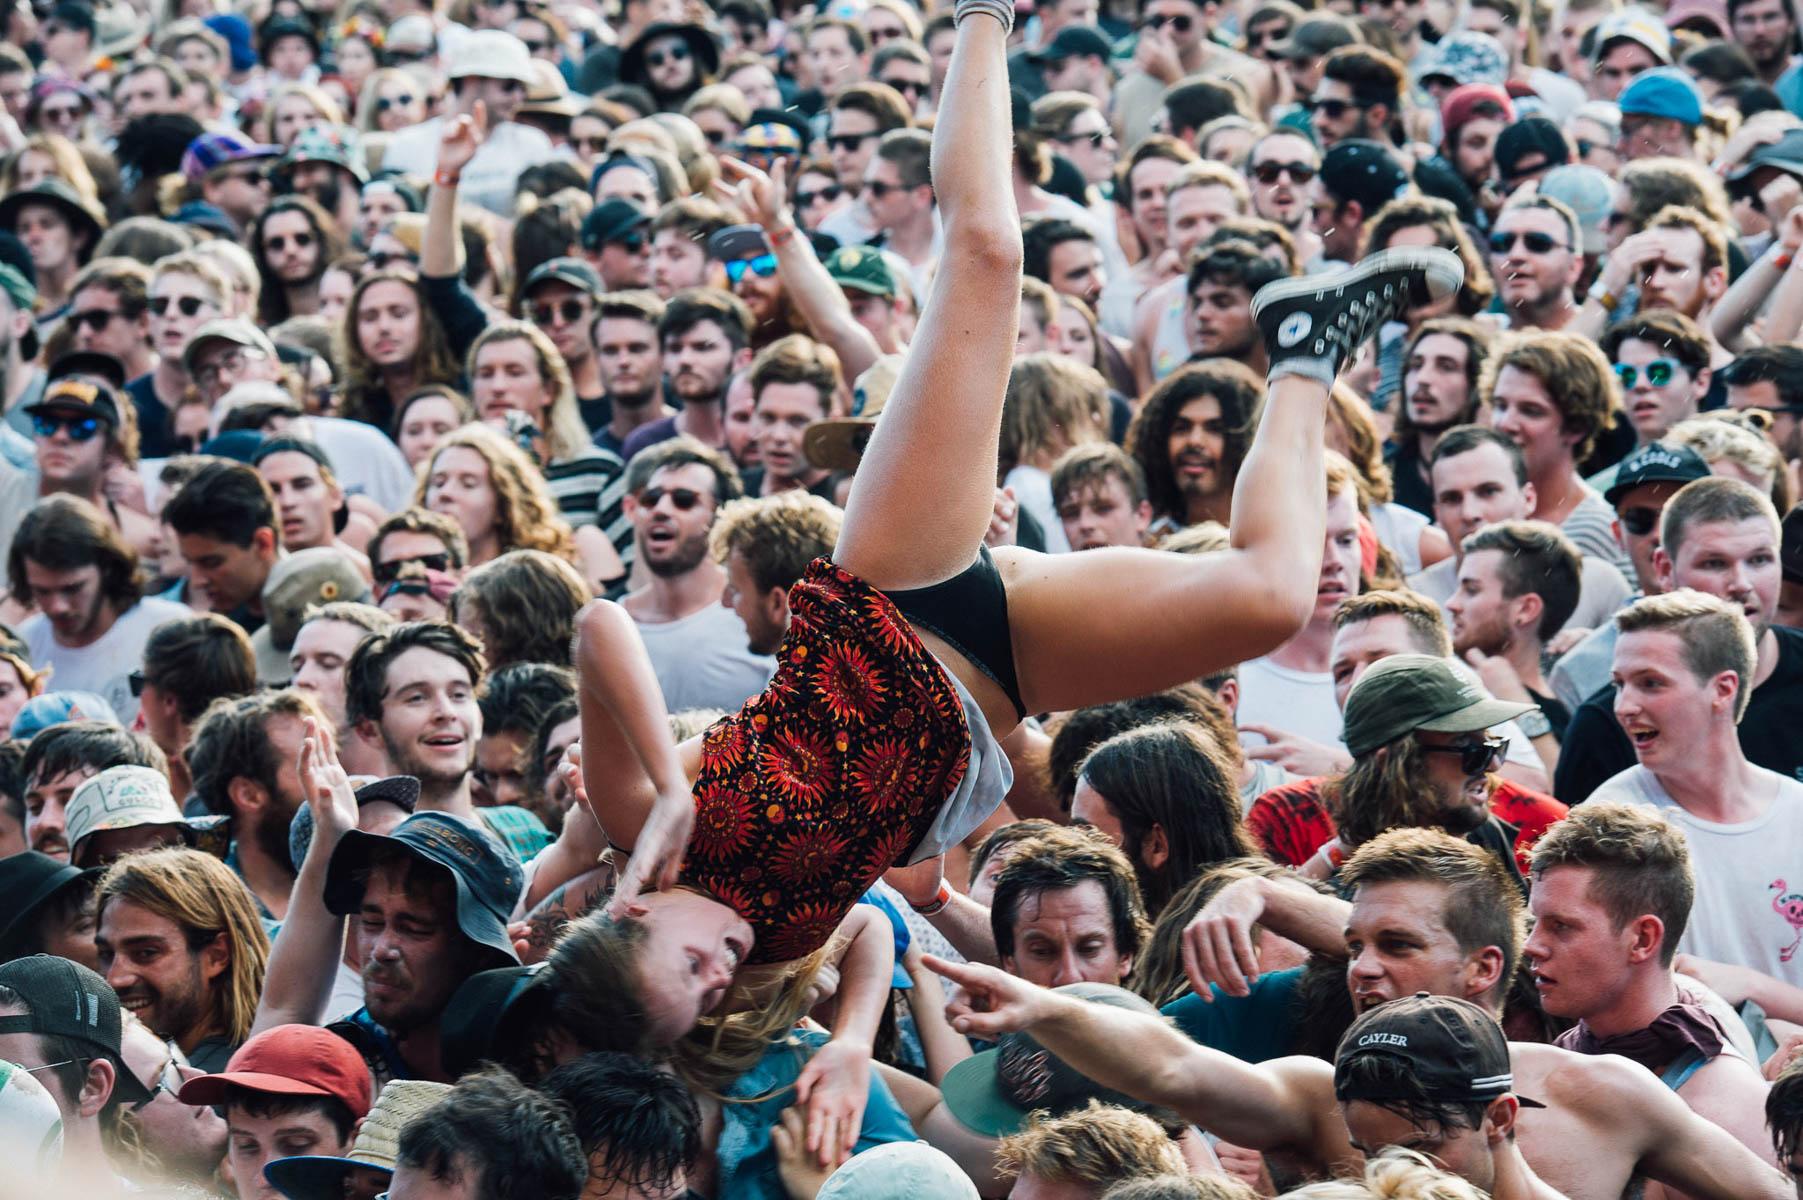 160207-lanewayfestival-violentsohocrowd-8192